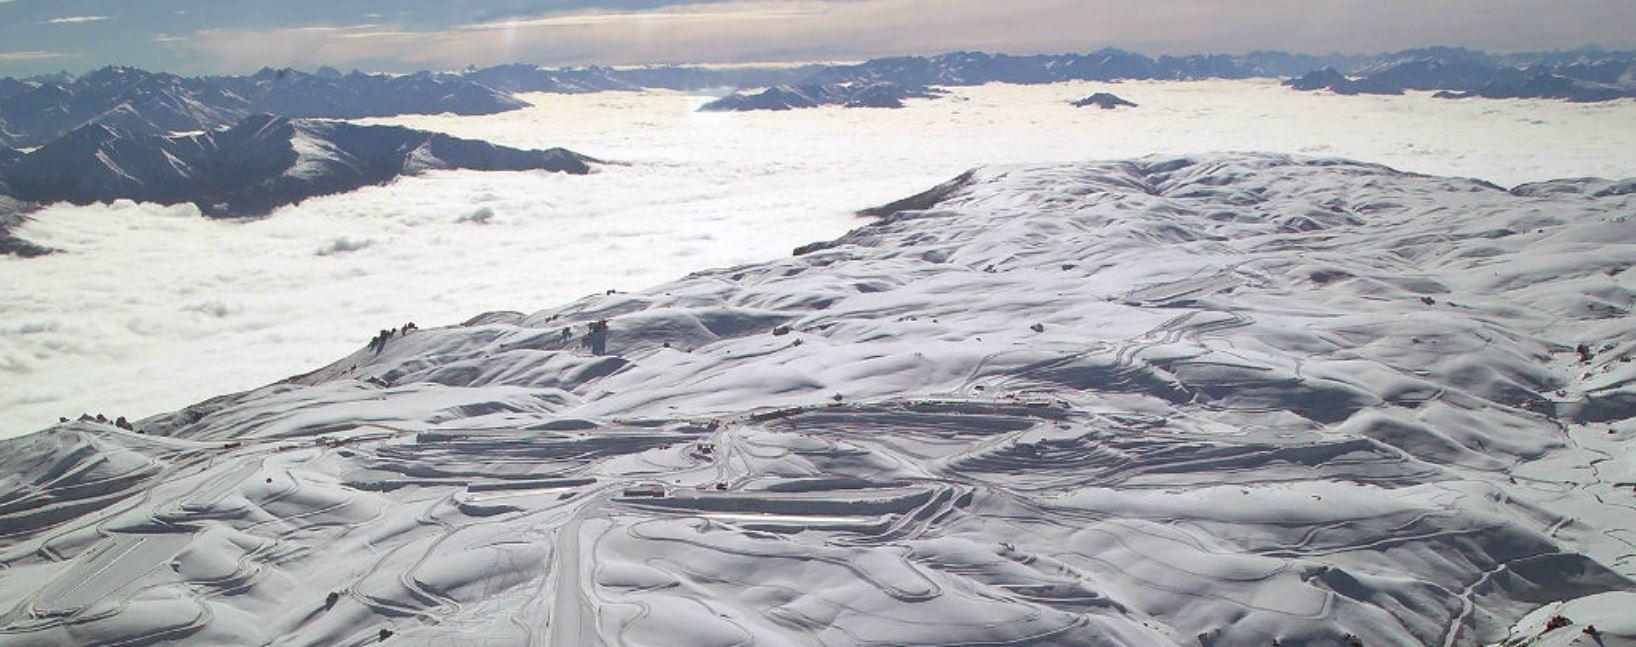 snowfarm-merino-muster.jpg (173 KB)